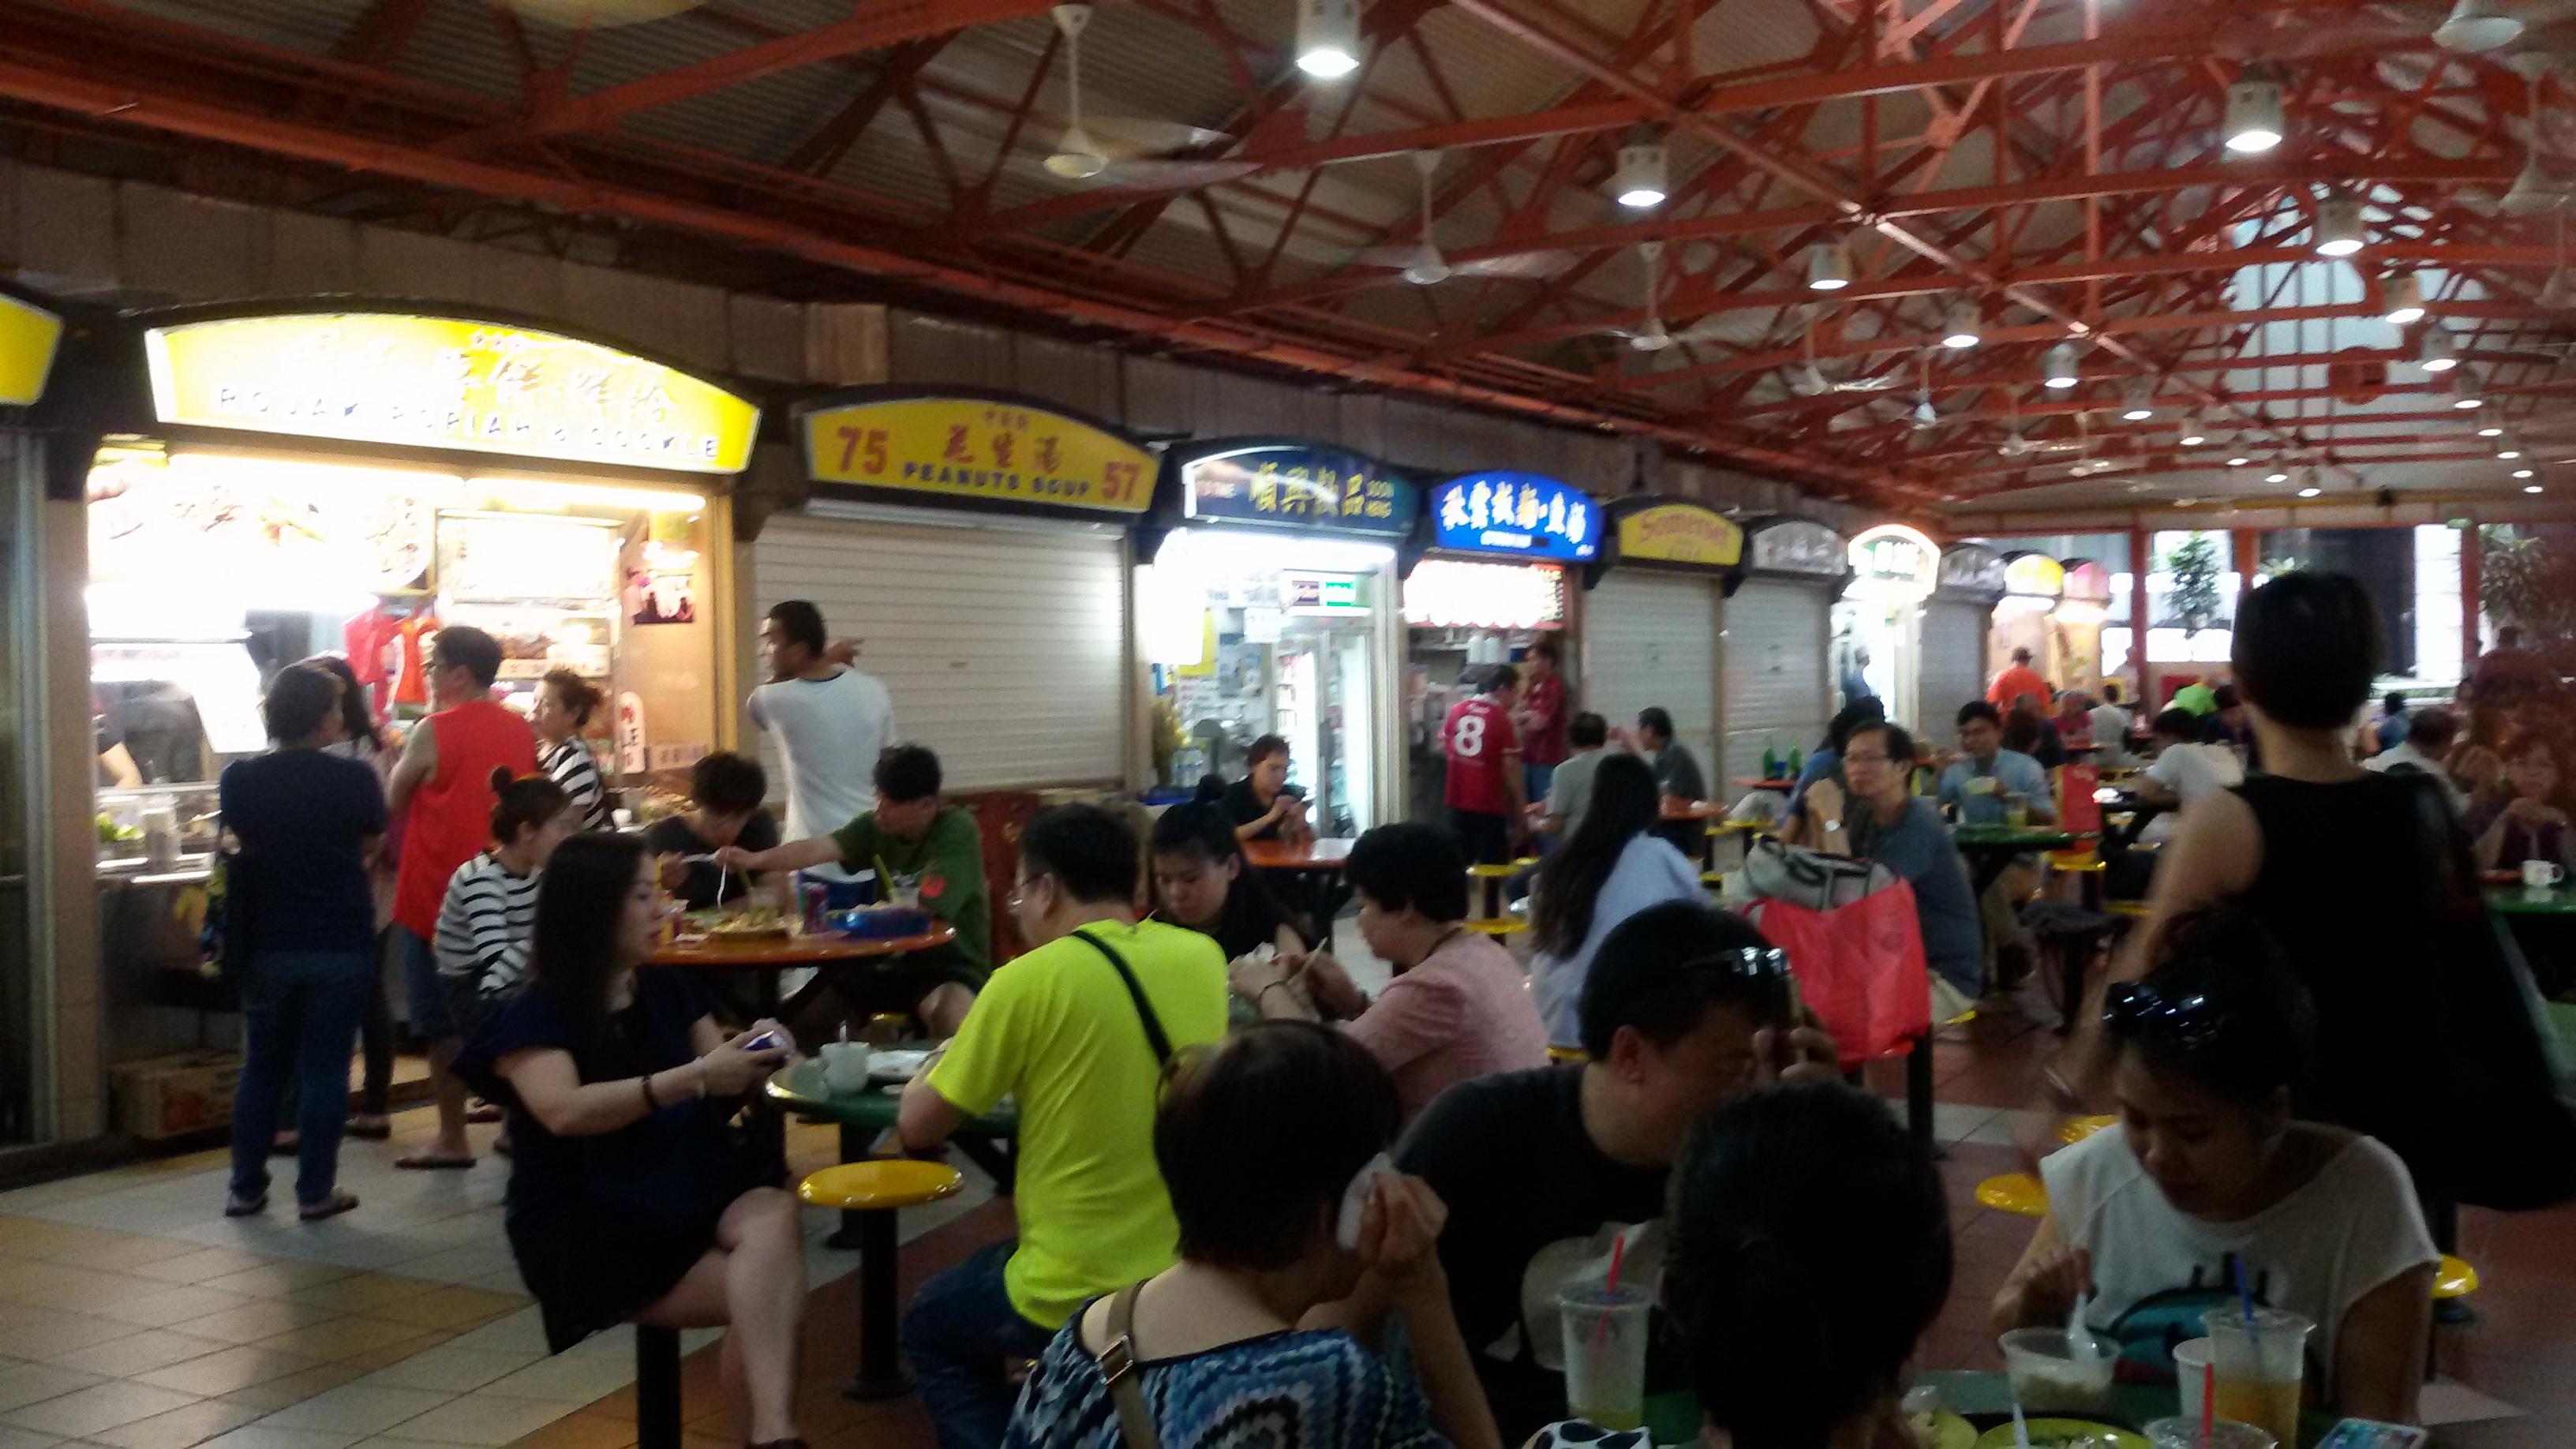 Prima eten op de vele foodcourts in Maleisië en Singapore